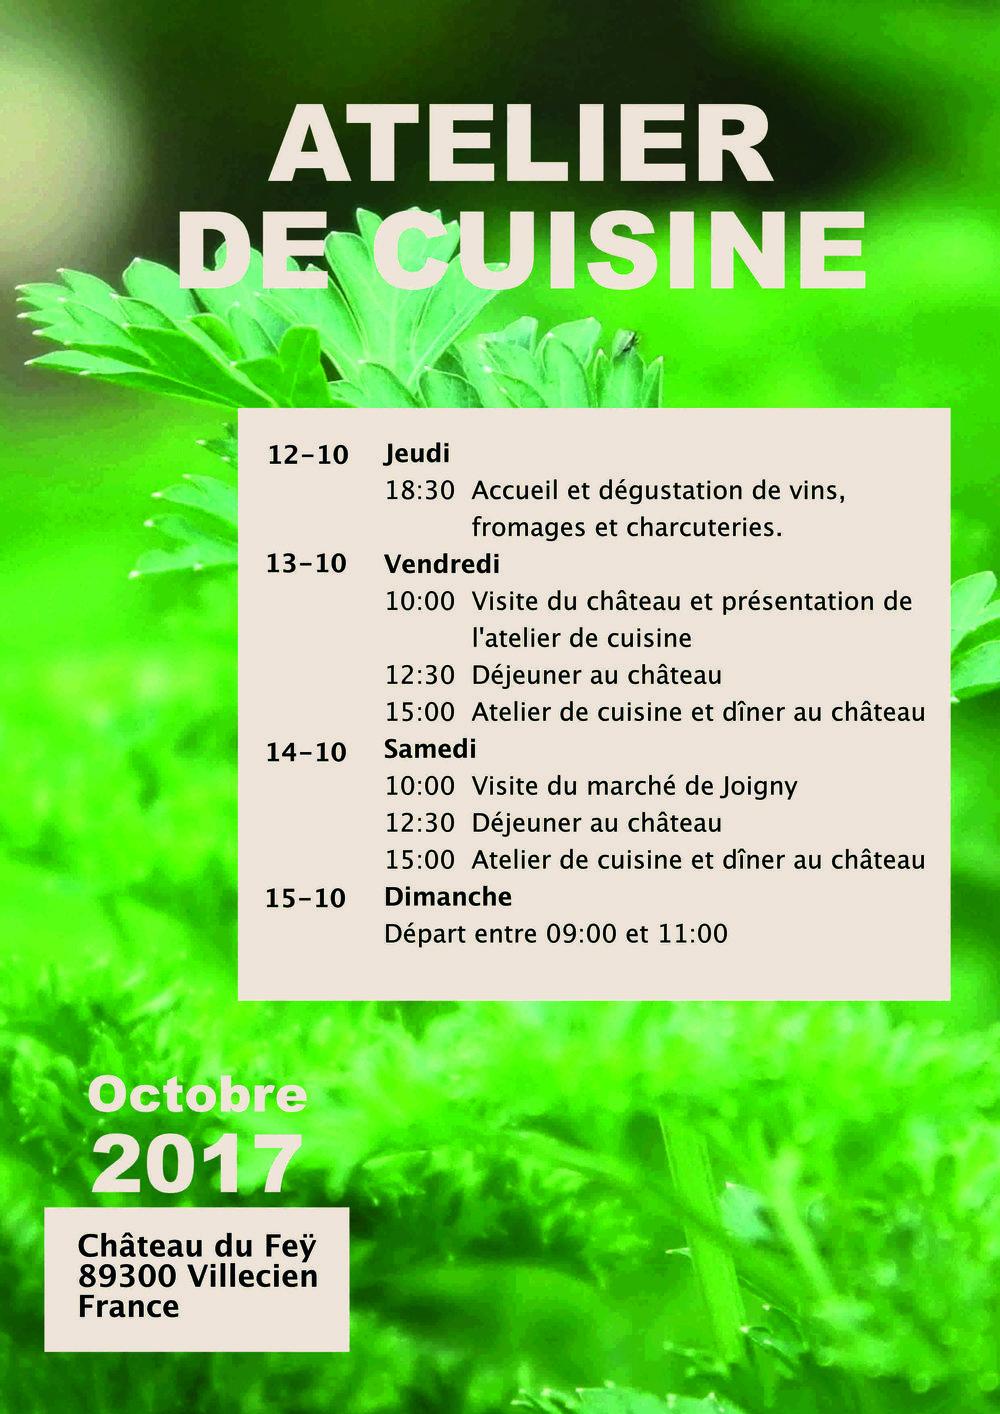 Atelier de cuisine octobre 2017-01.jpg